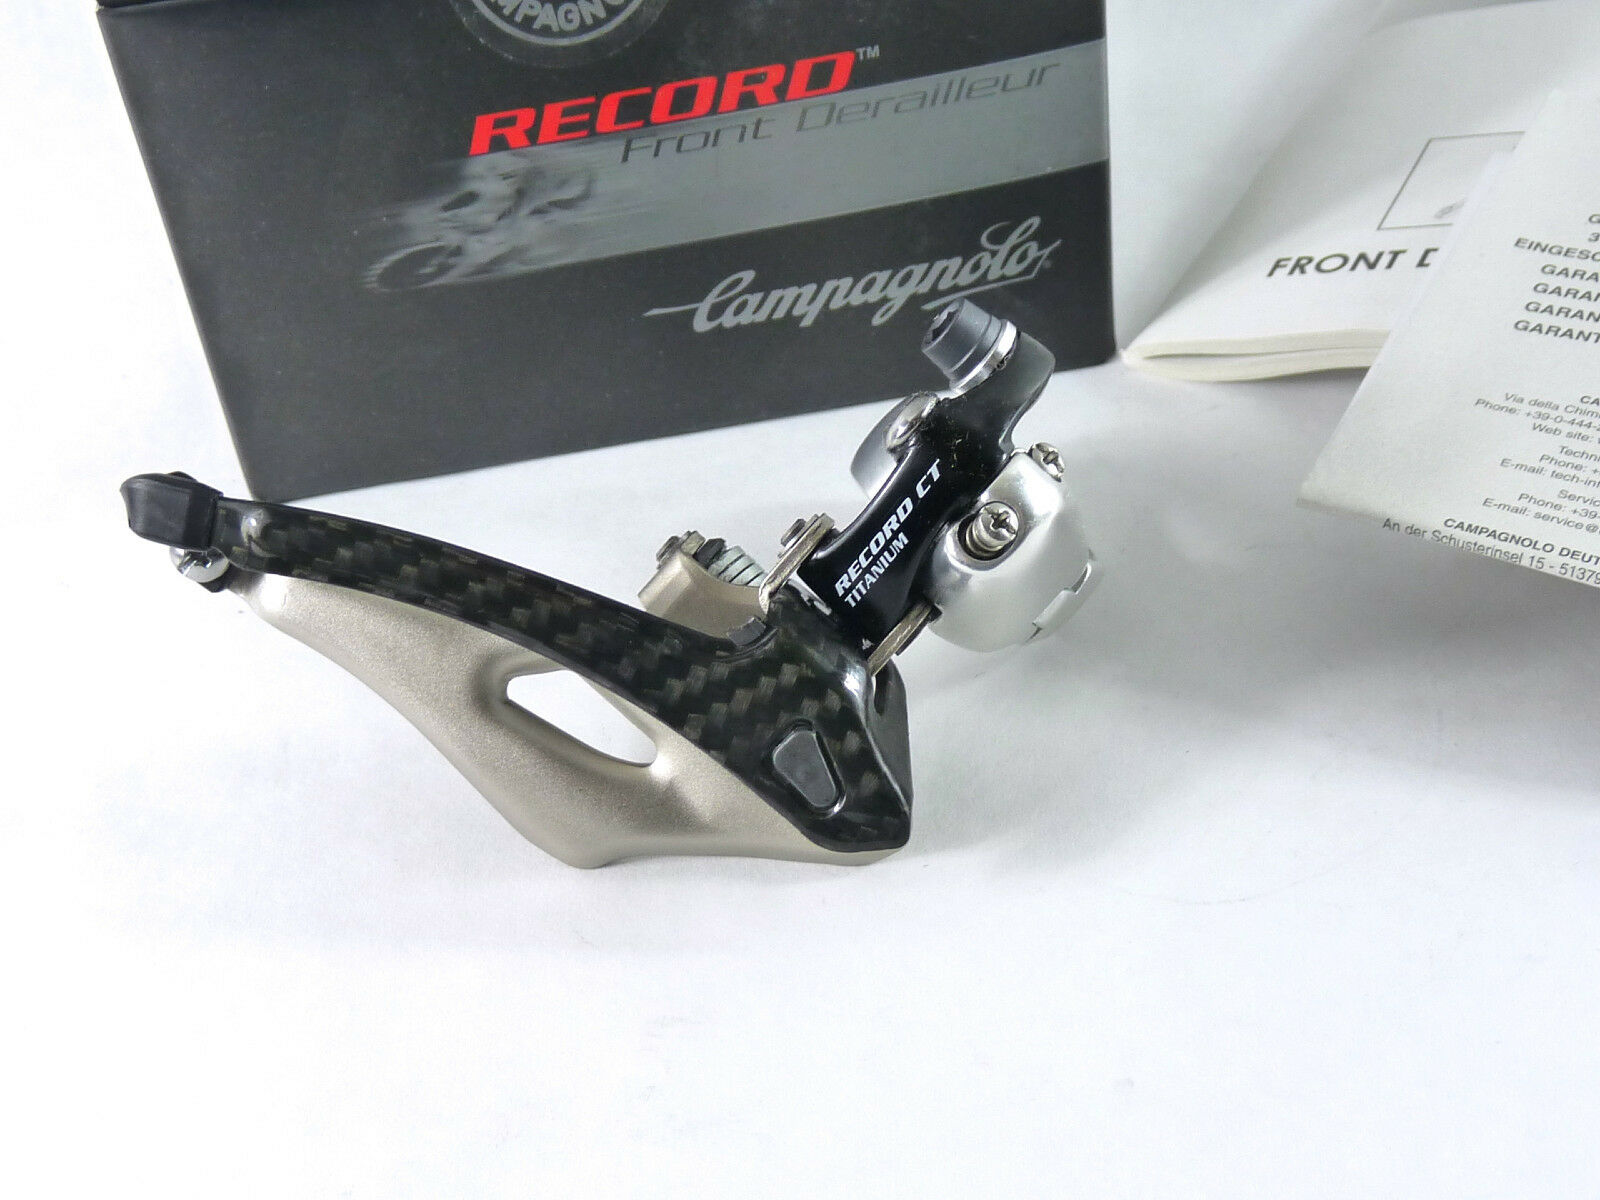 Desviador delantero Campagnolo Record Compacto Titanio & Cochebono Bicicleta Compacto 28.6 Nuevo Viejo Stock